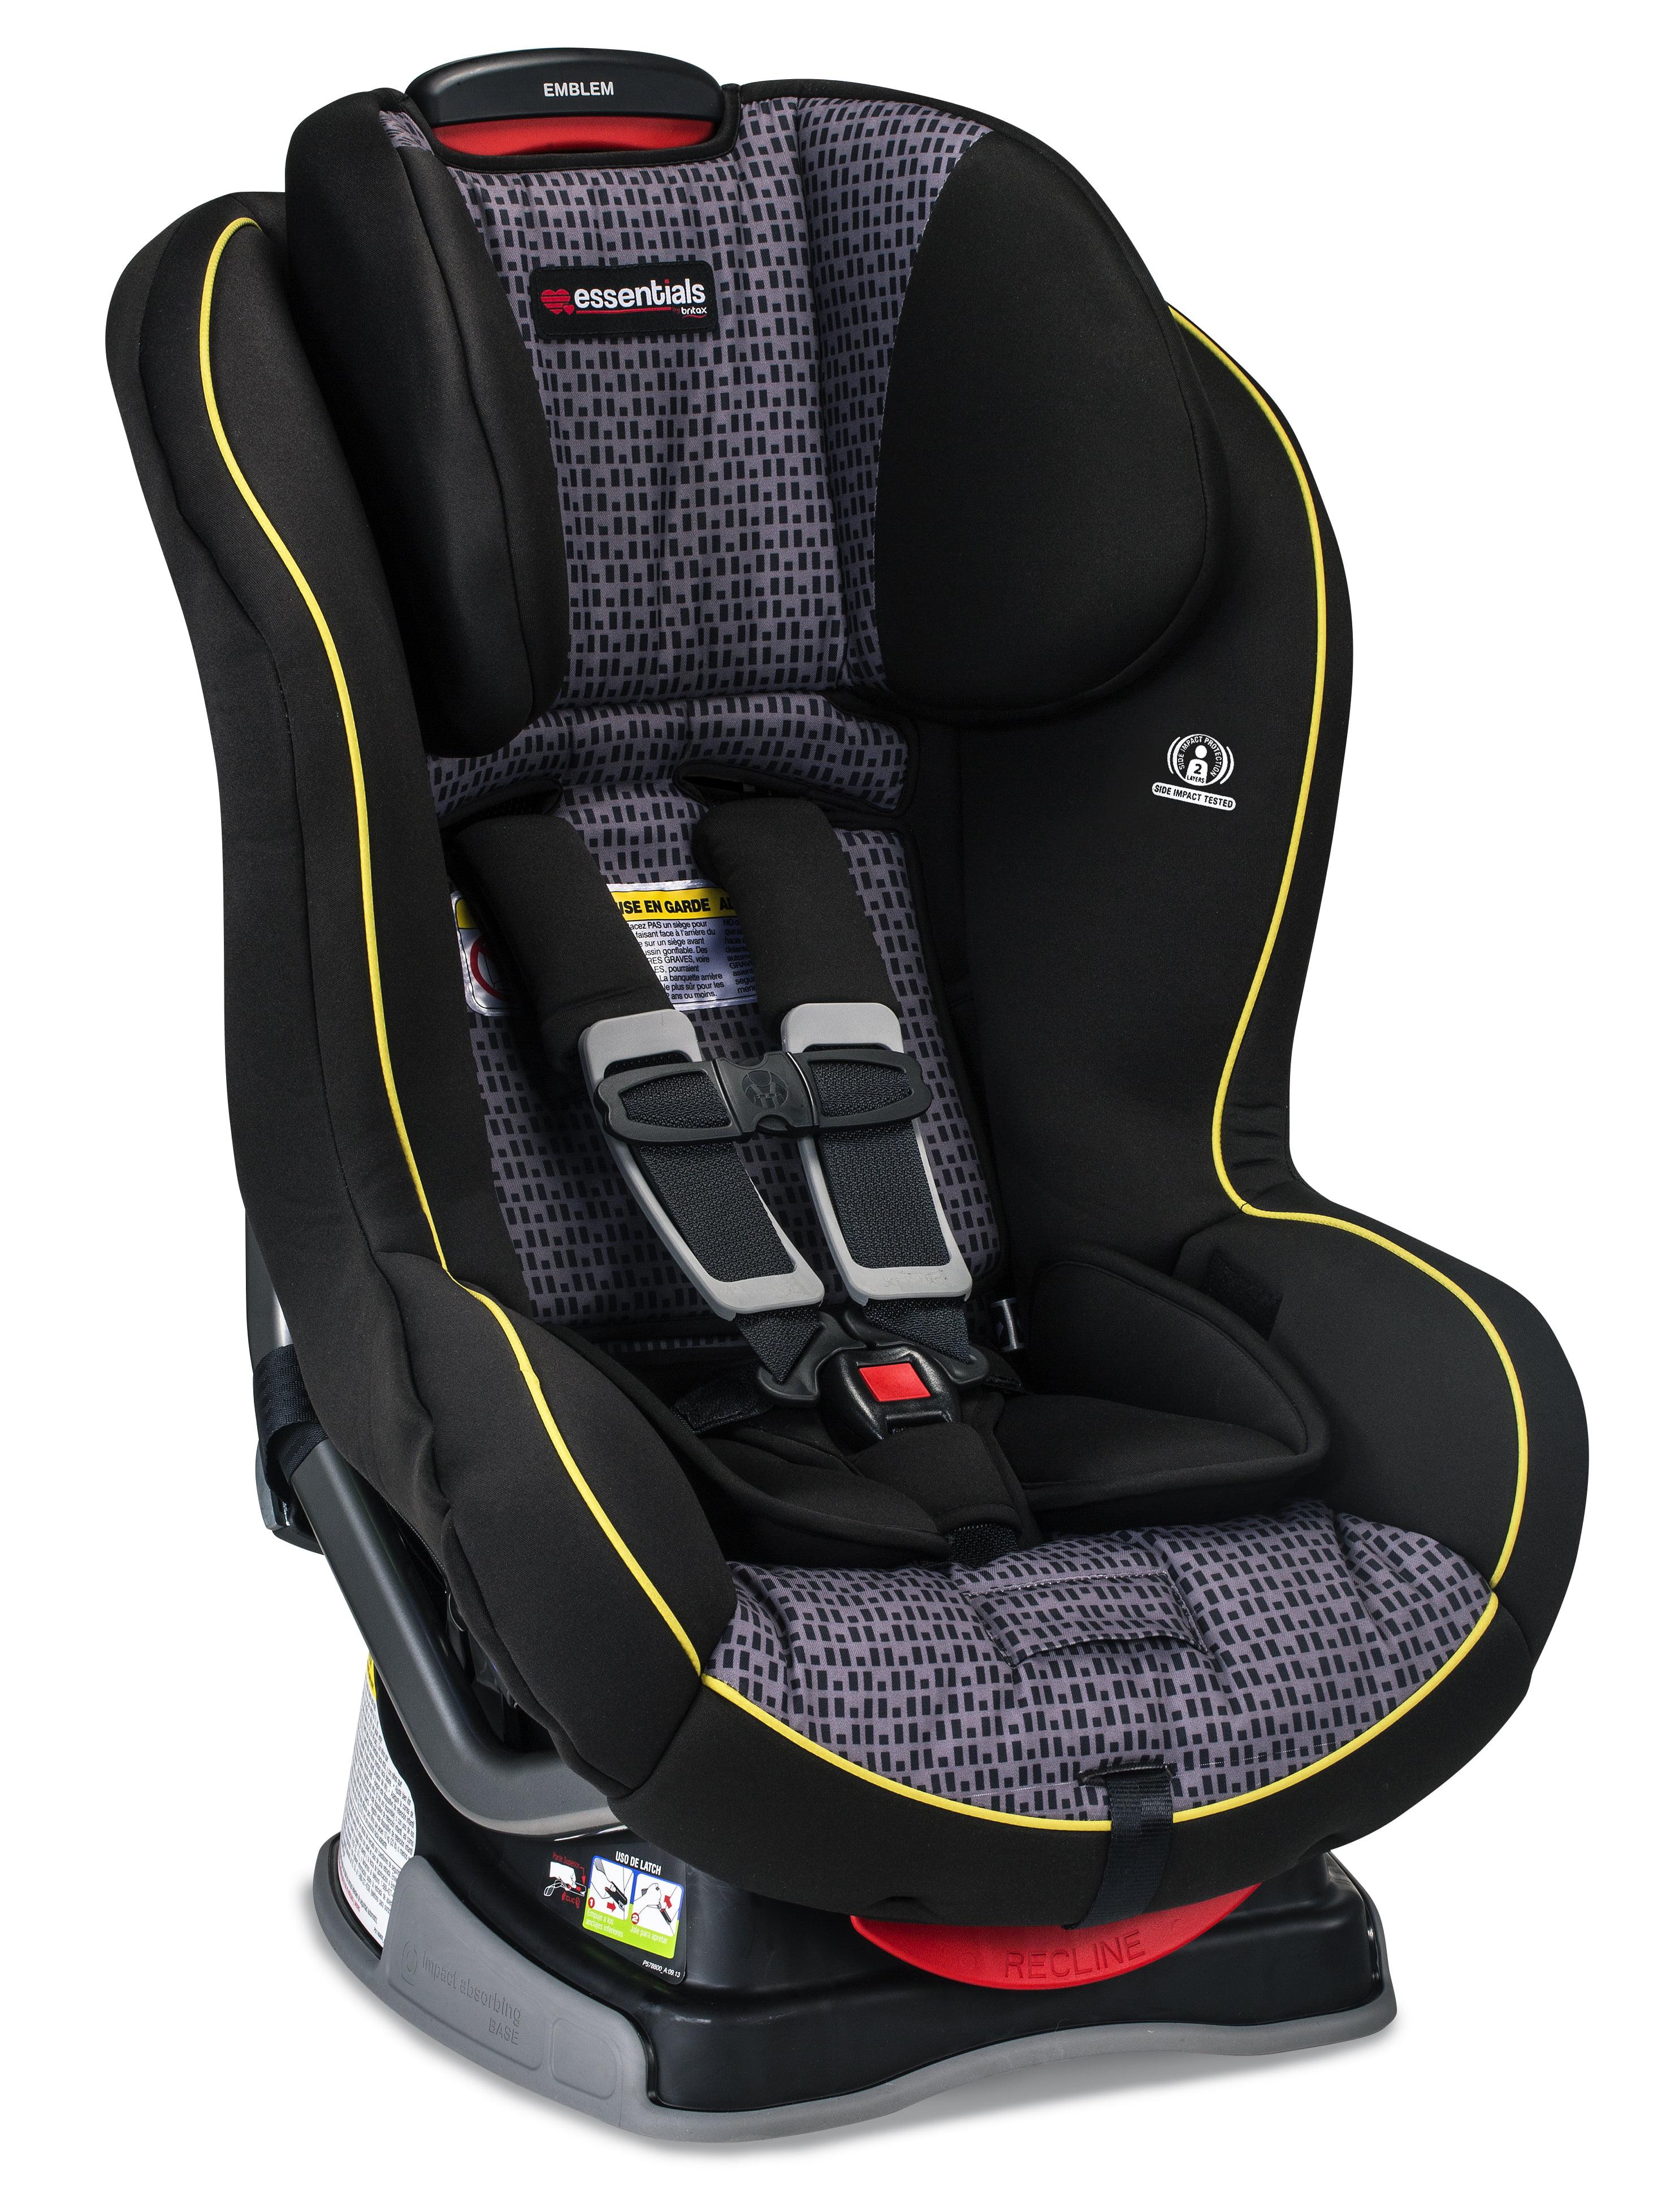 Britax Emblem Convertible Car Seat, Pulse by Britax